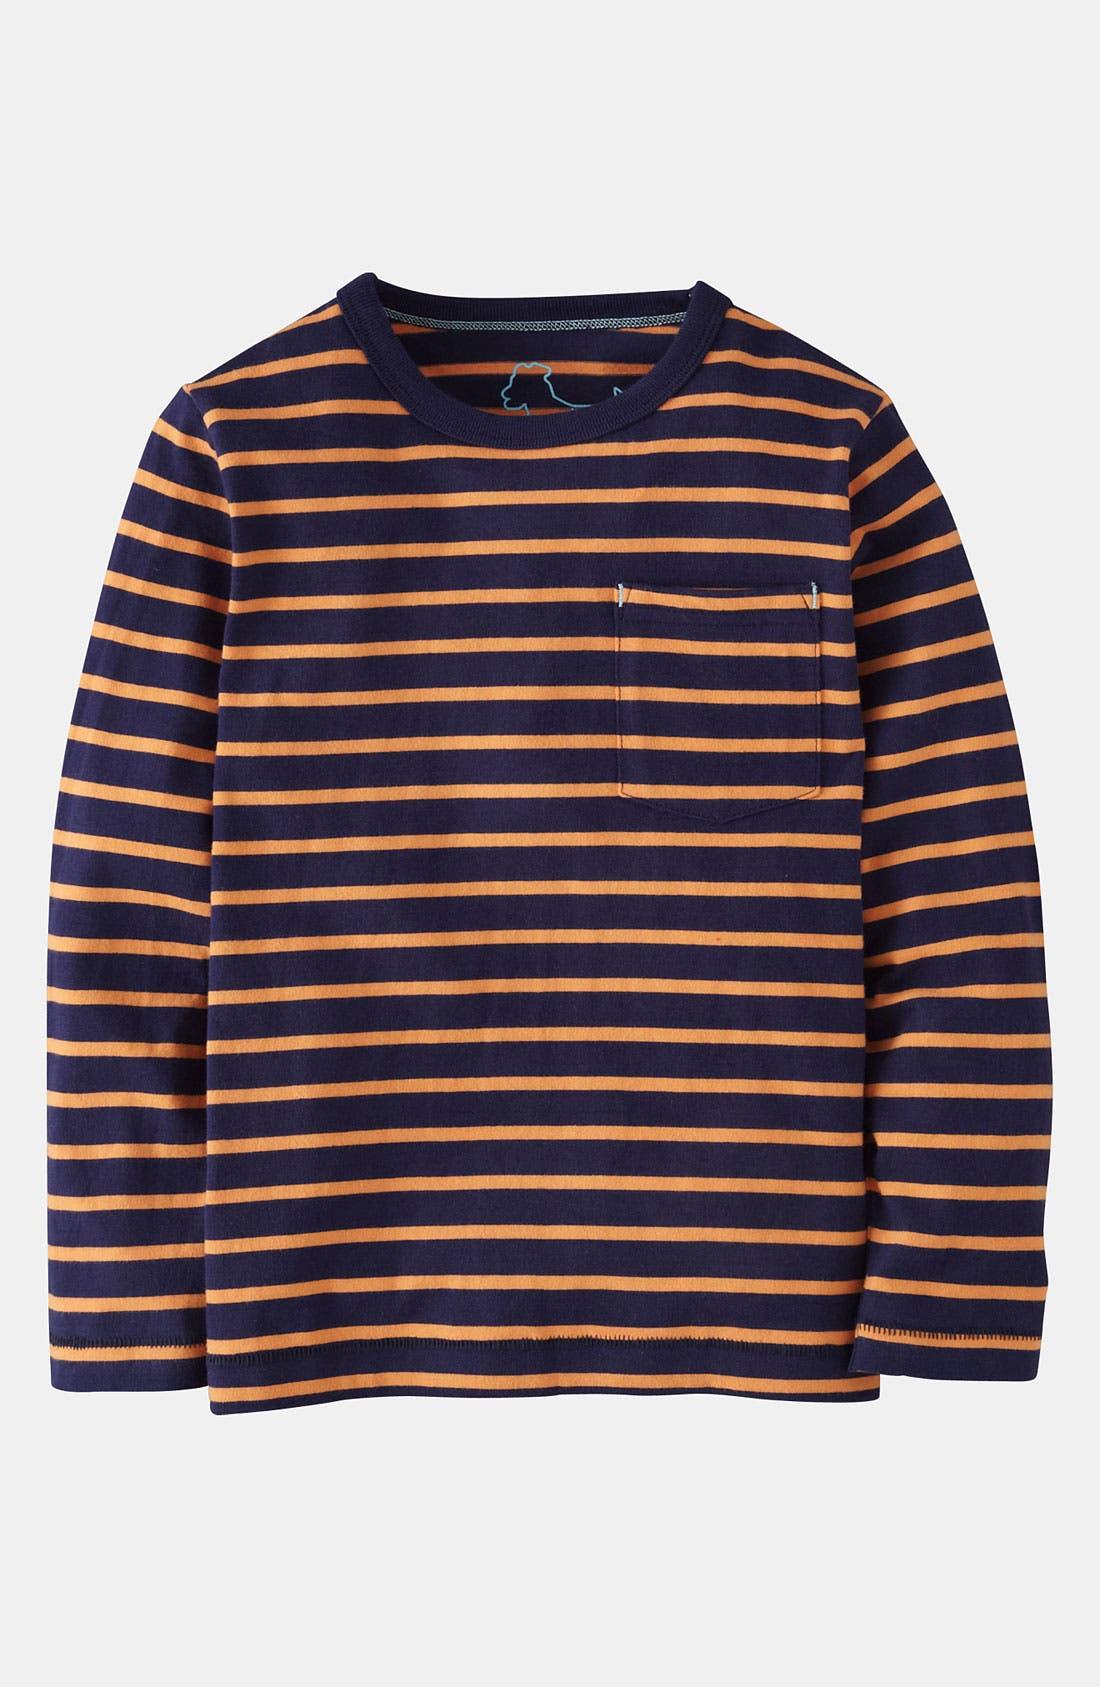 Alternate Image 1 Selected - Mini Boden Stripe T-Shirt (Little Boys & Big Boys)